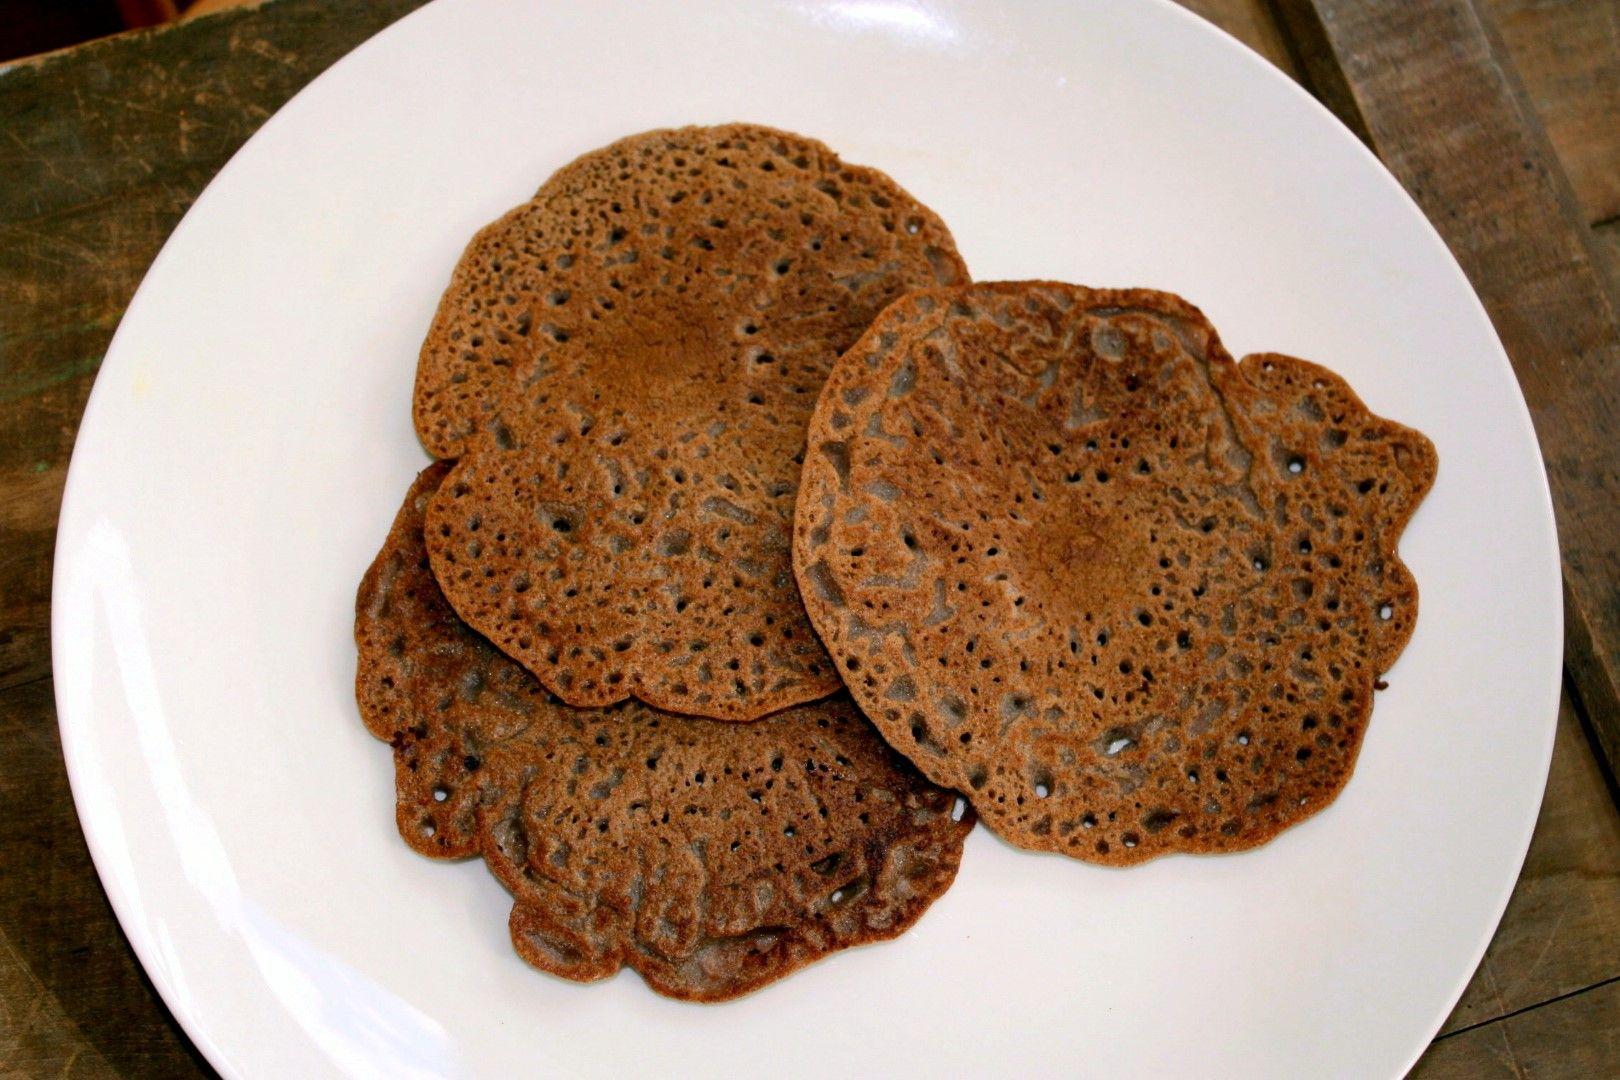 100 Teff Injera Ethiopian Sourdough Flatbread Fermenting For Foodies Recipe Savoury Food Baking Recipes Gluten Free Recipes Baking